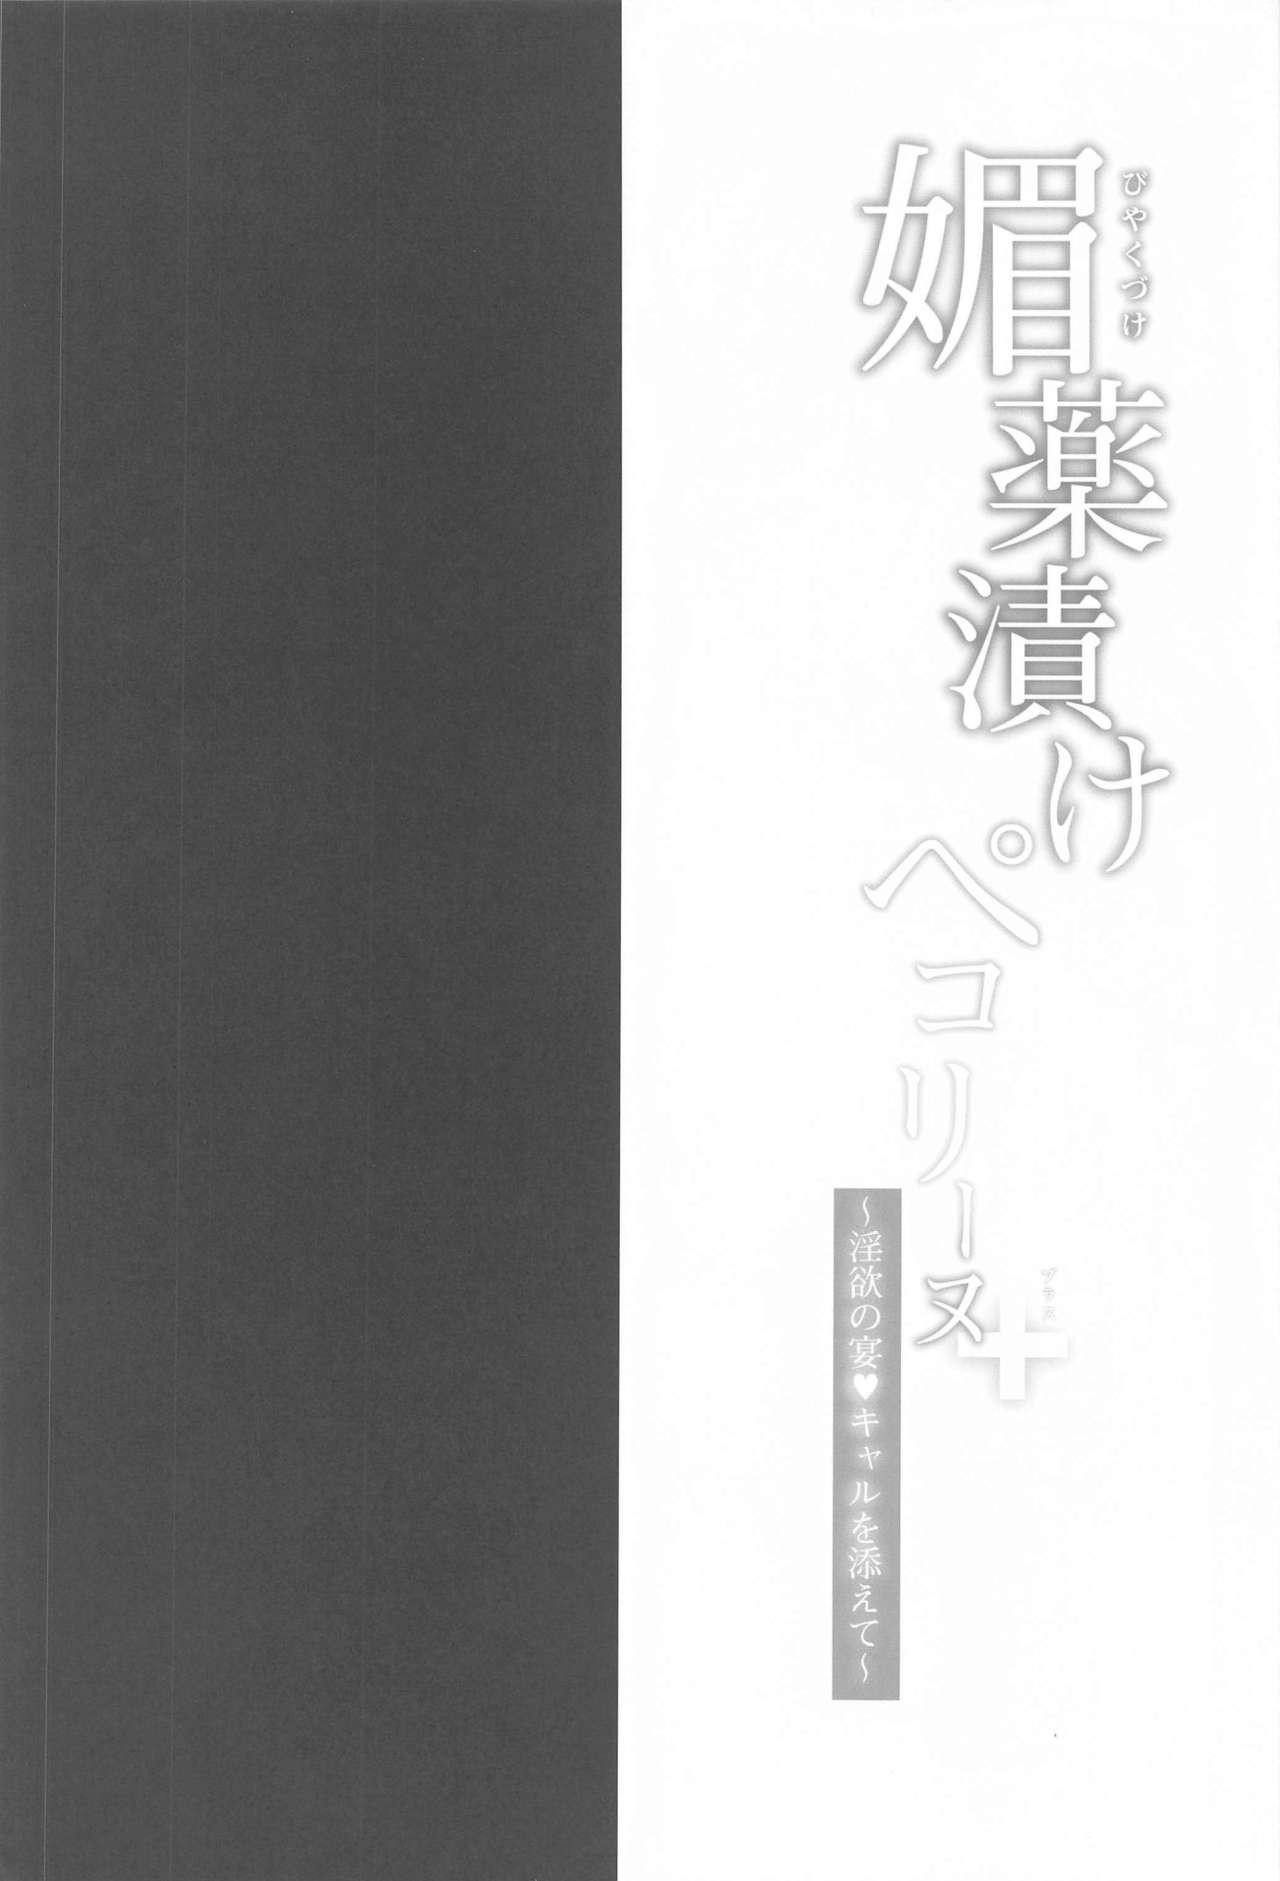 biyakuzukepekorinu+ ~inyokunotage・kyaruosoete~ 2